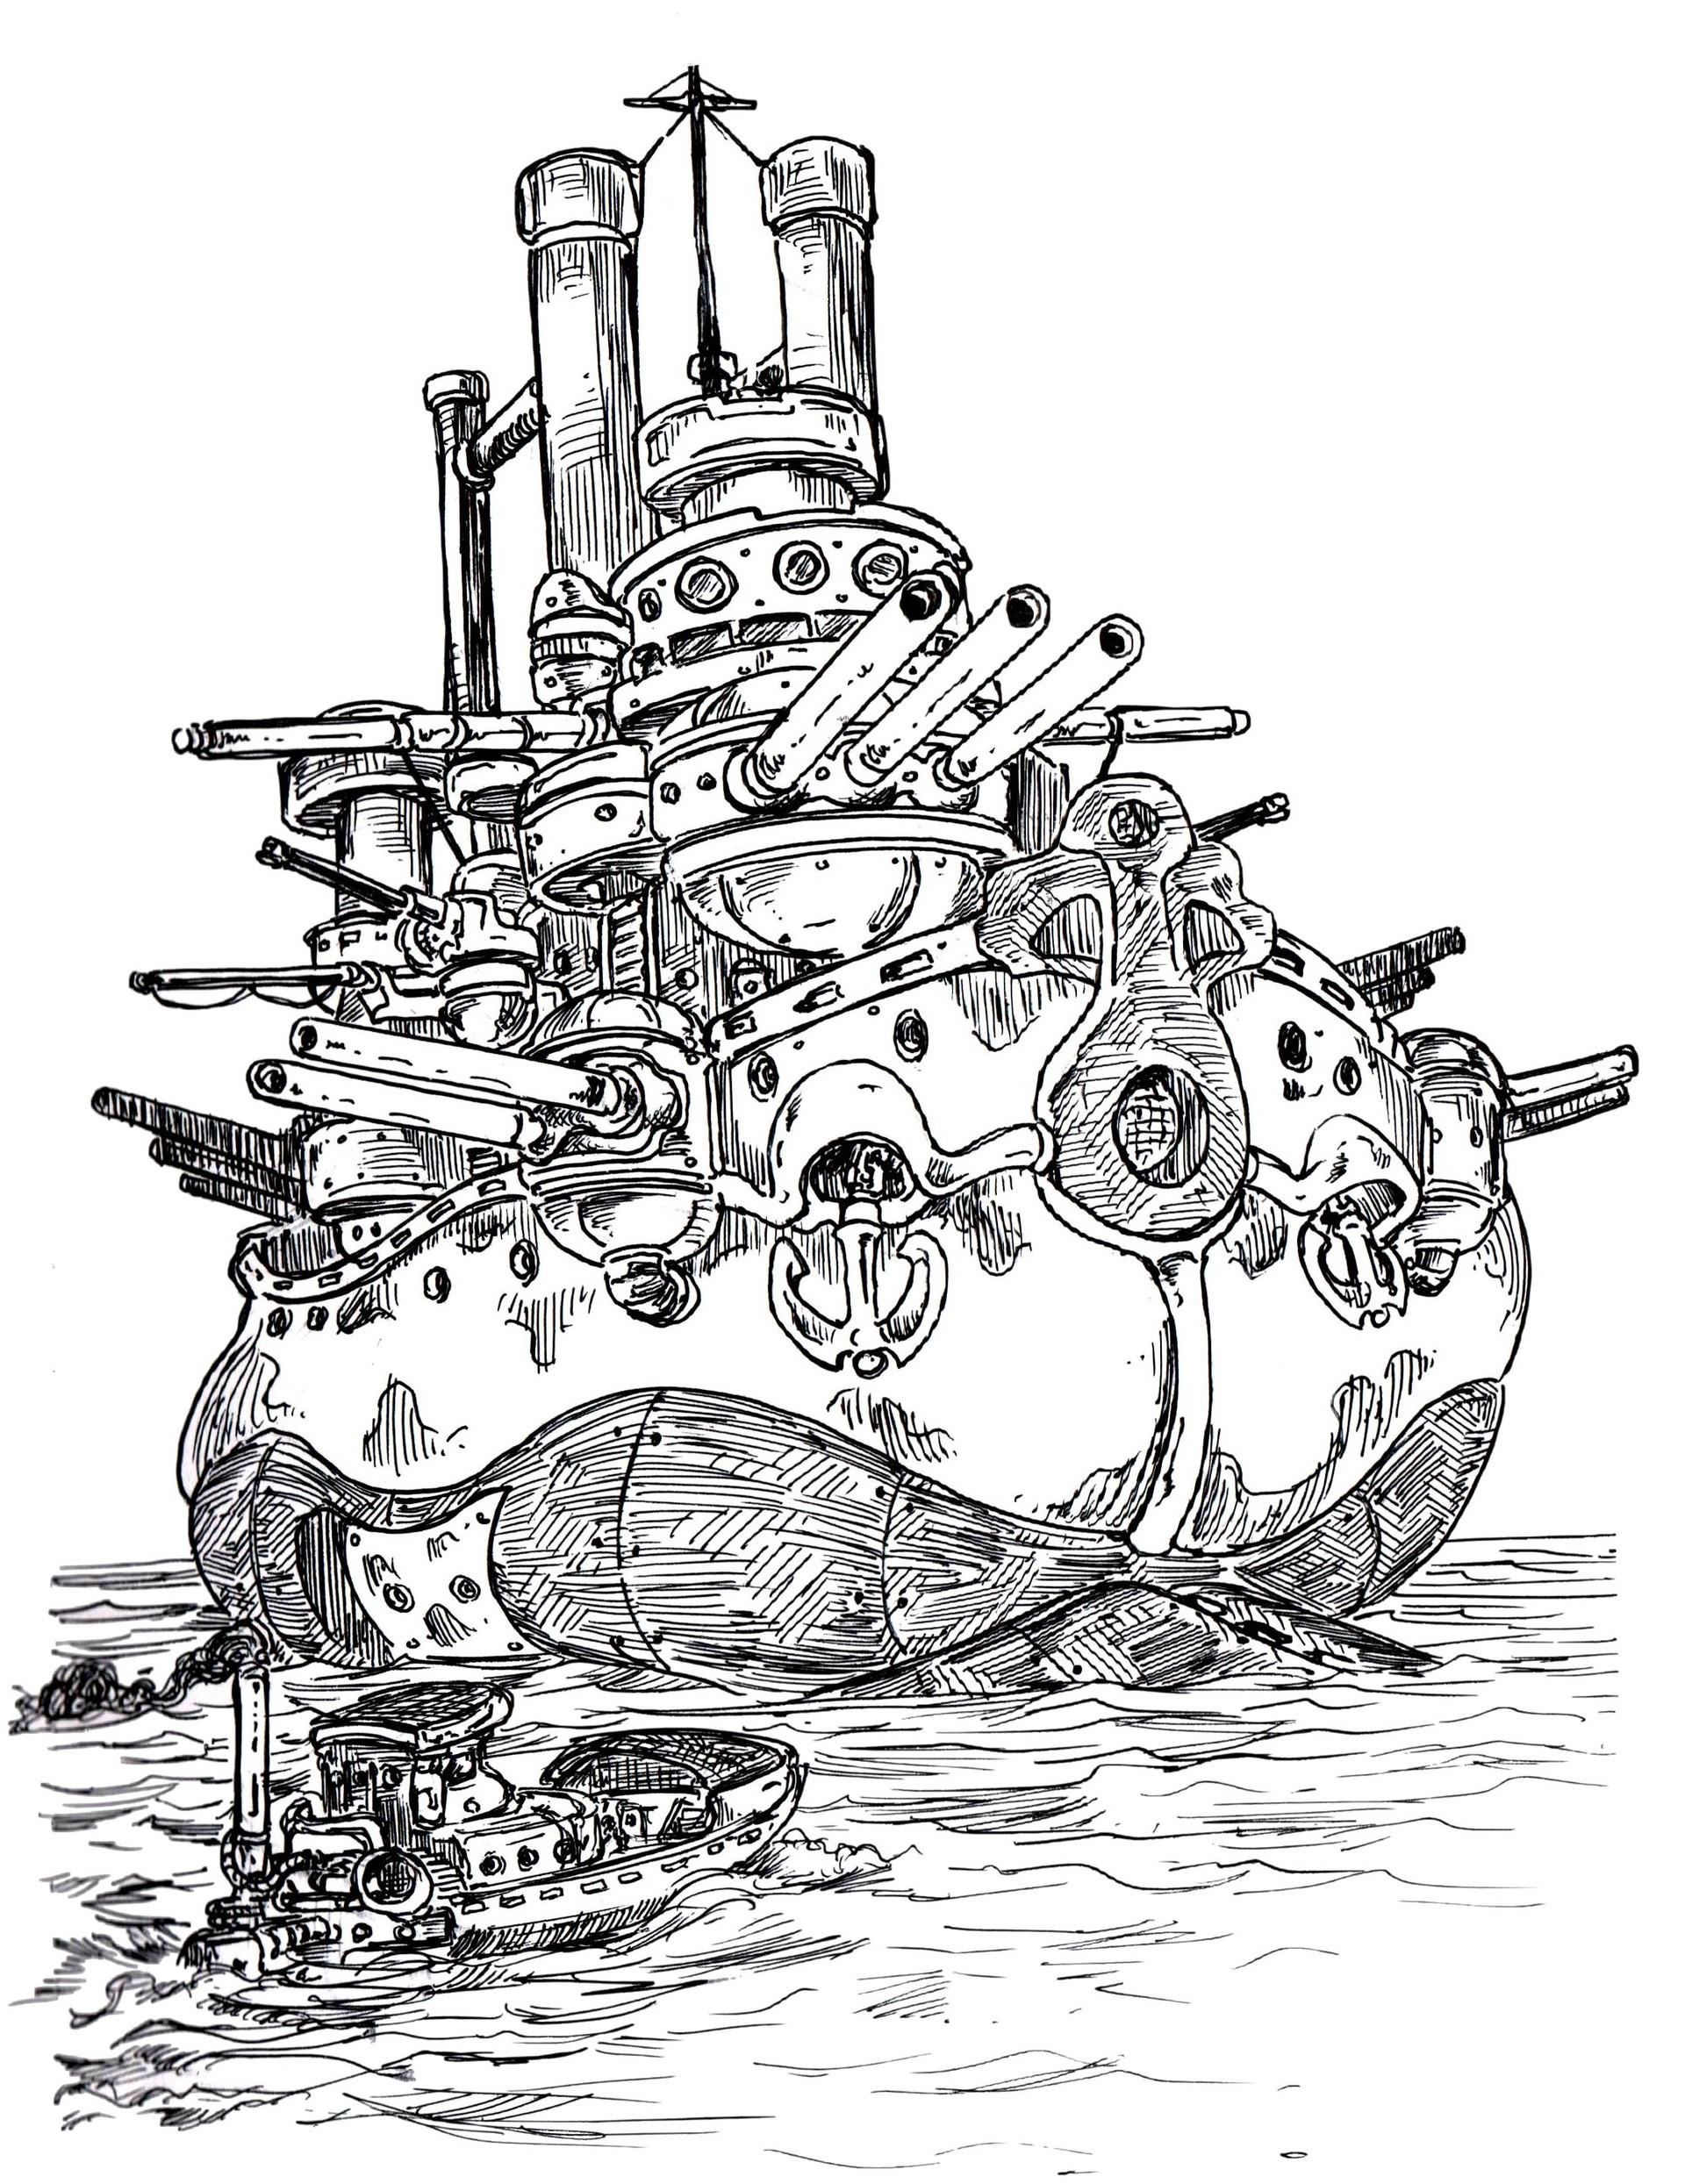 Vincent bryant 24 battleship